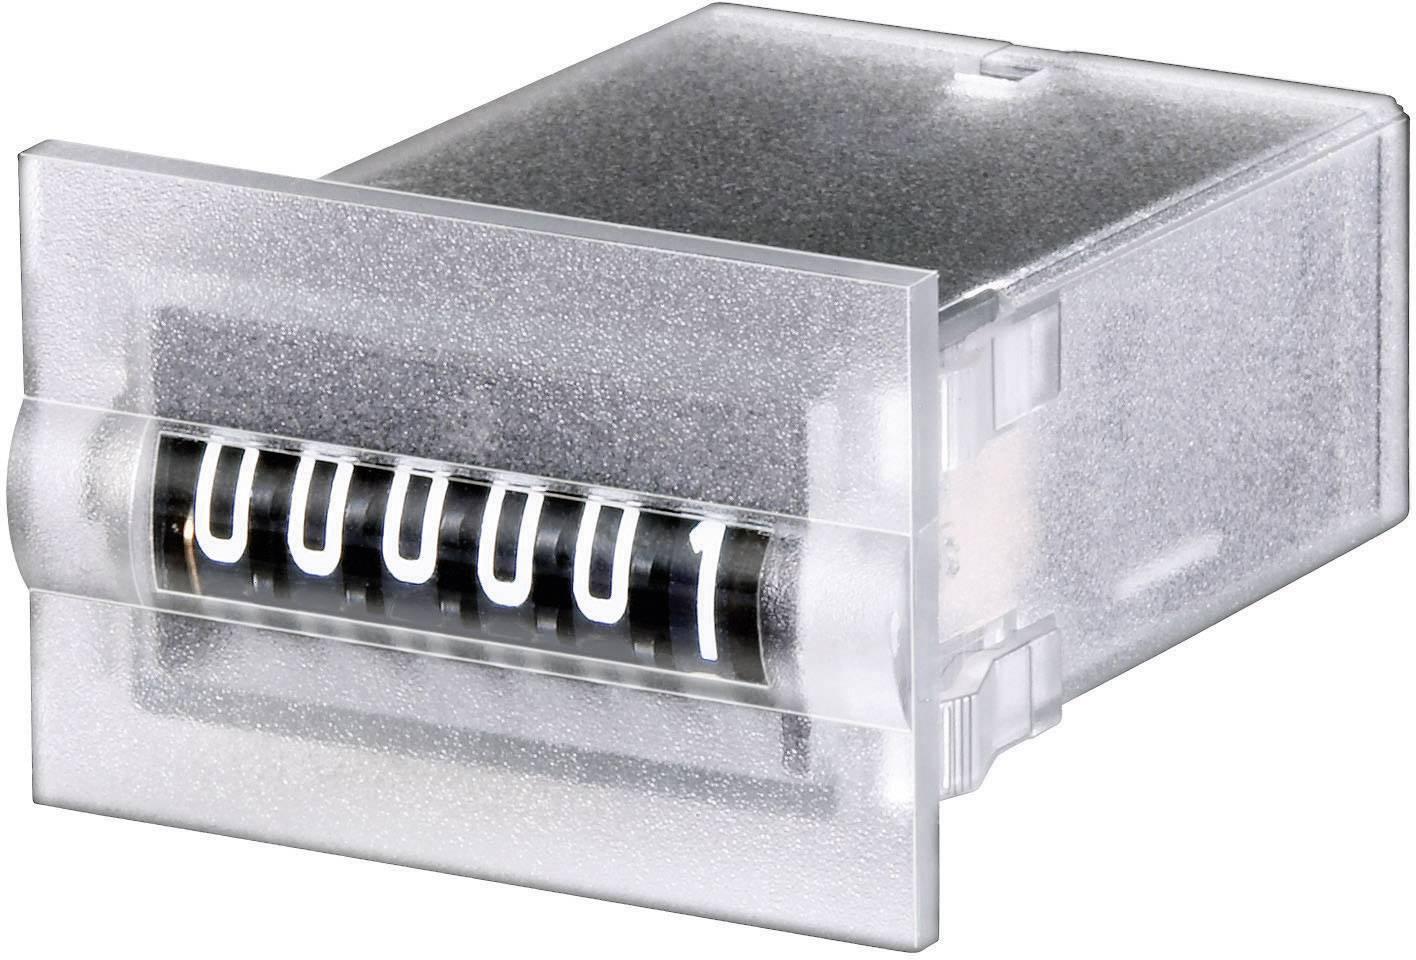 Mini čítač impulzov na panel Hengstler 634 CR0634810, 24 VDC